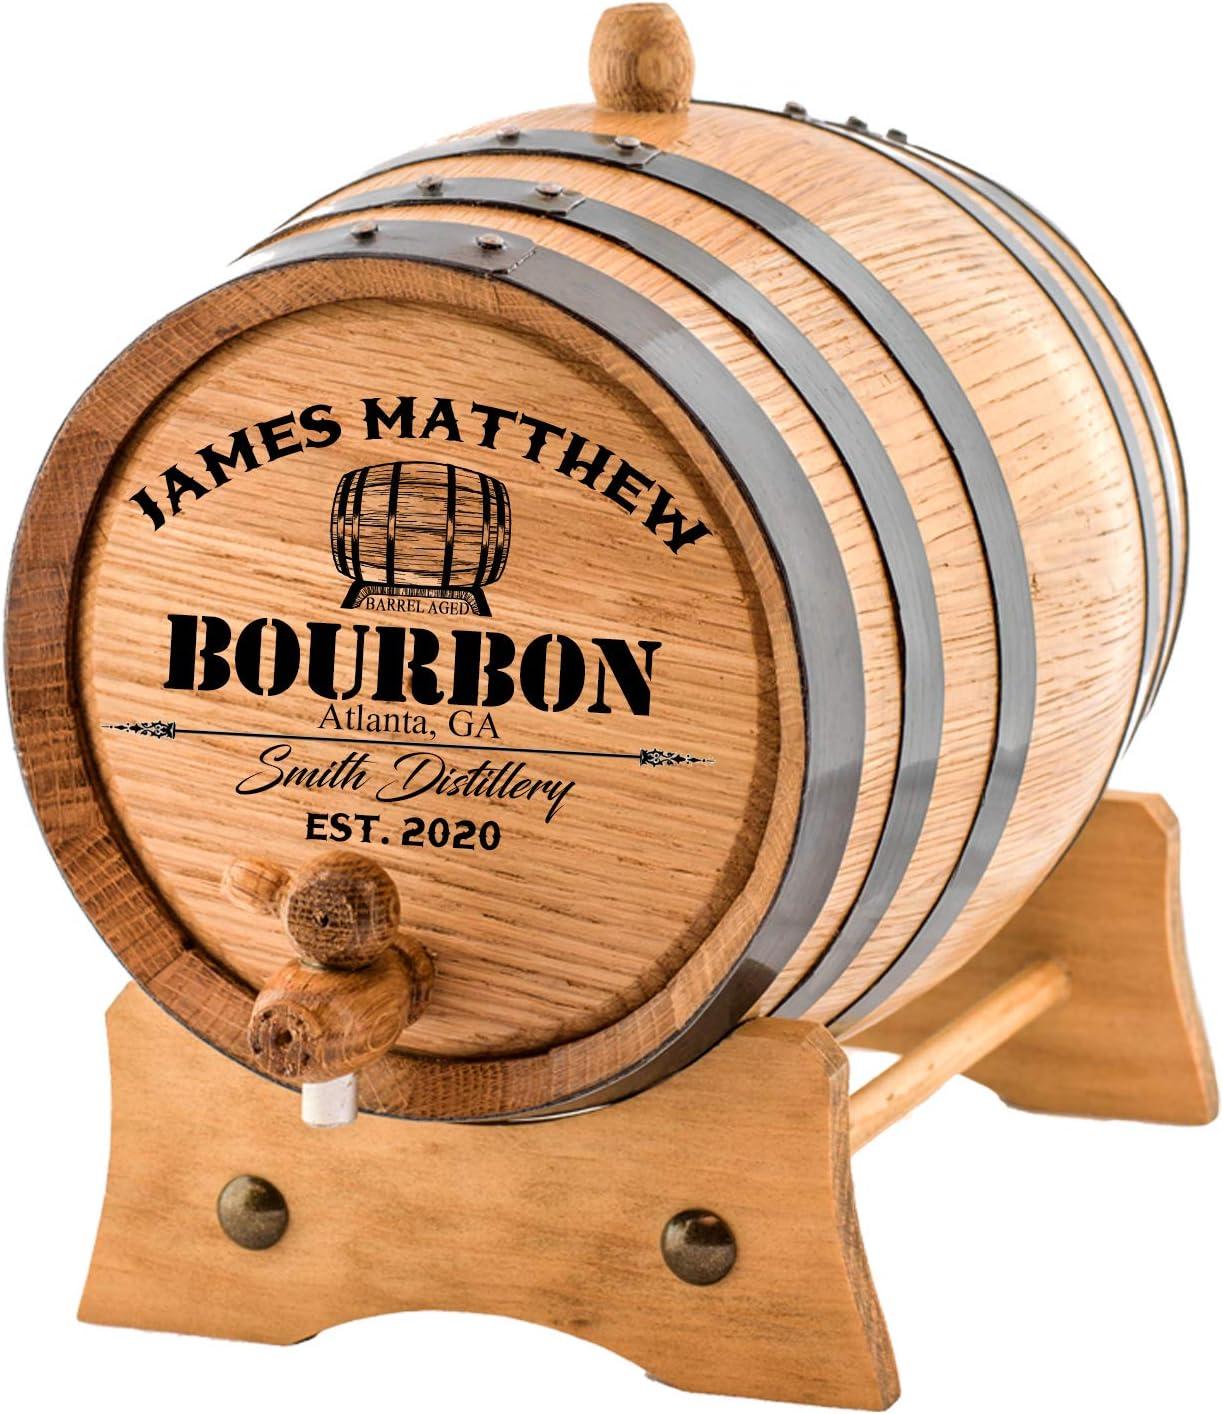 Personalized - Custom American Washington Mall White Barrel Aging Be super welcome Bourbon Oak